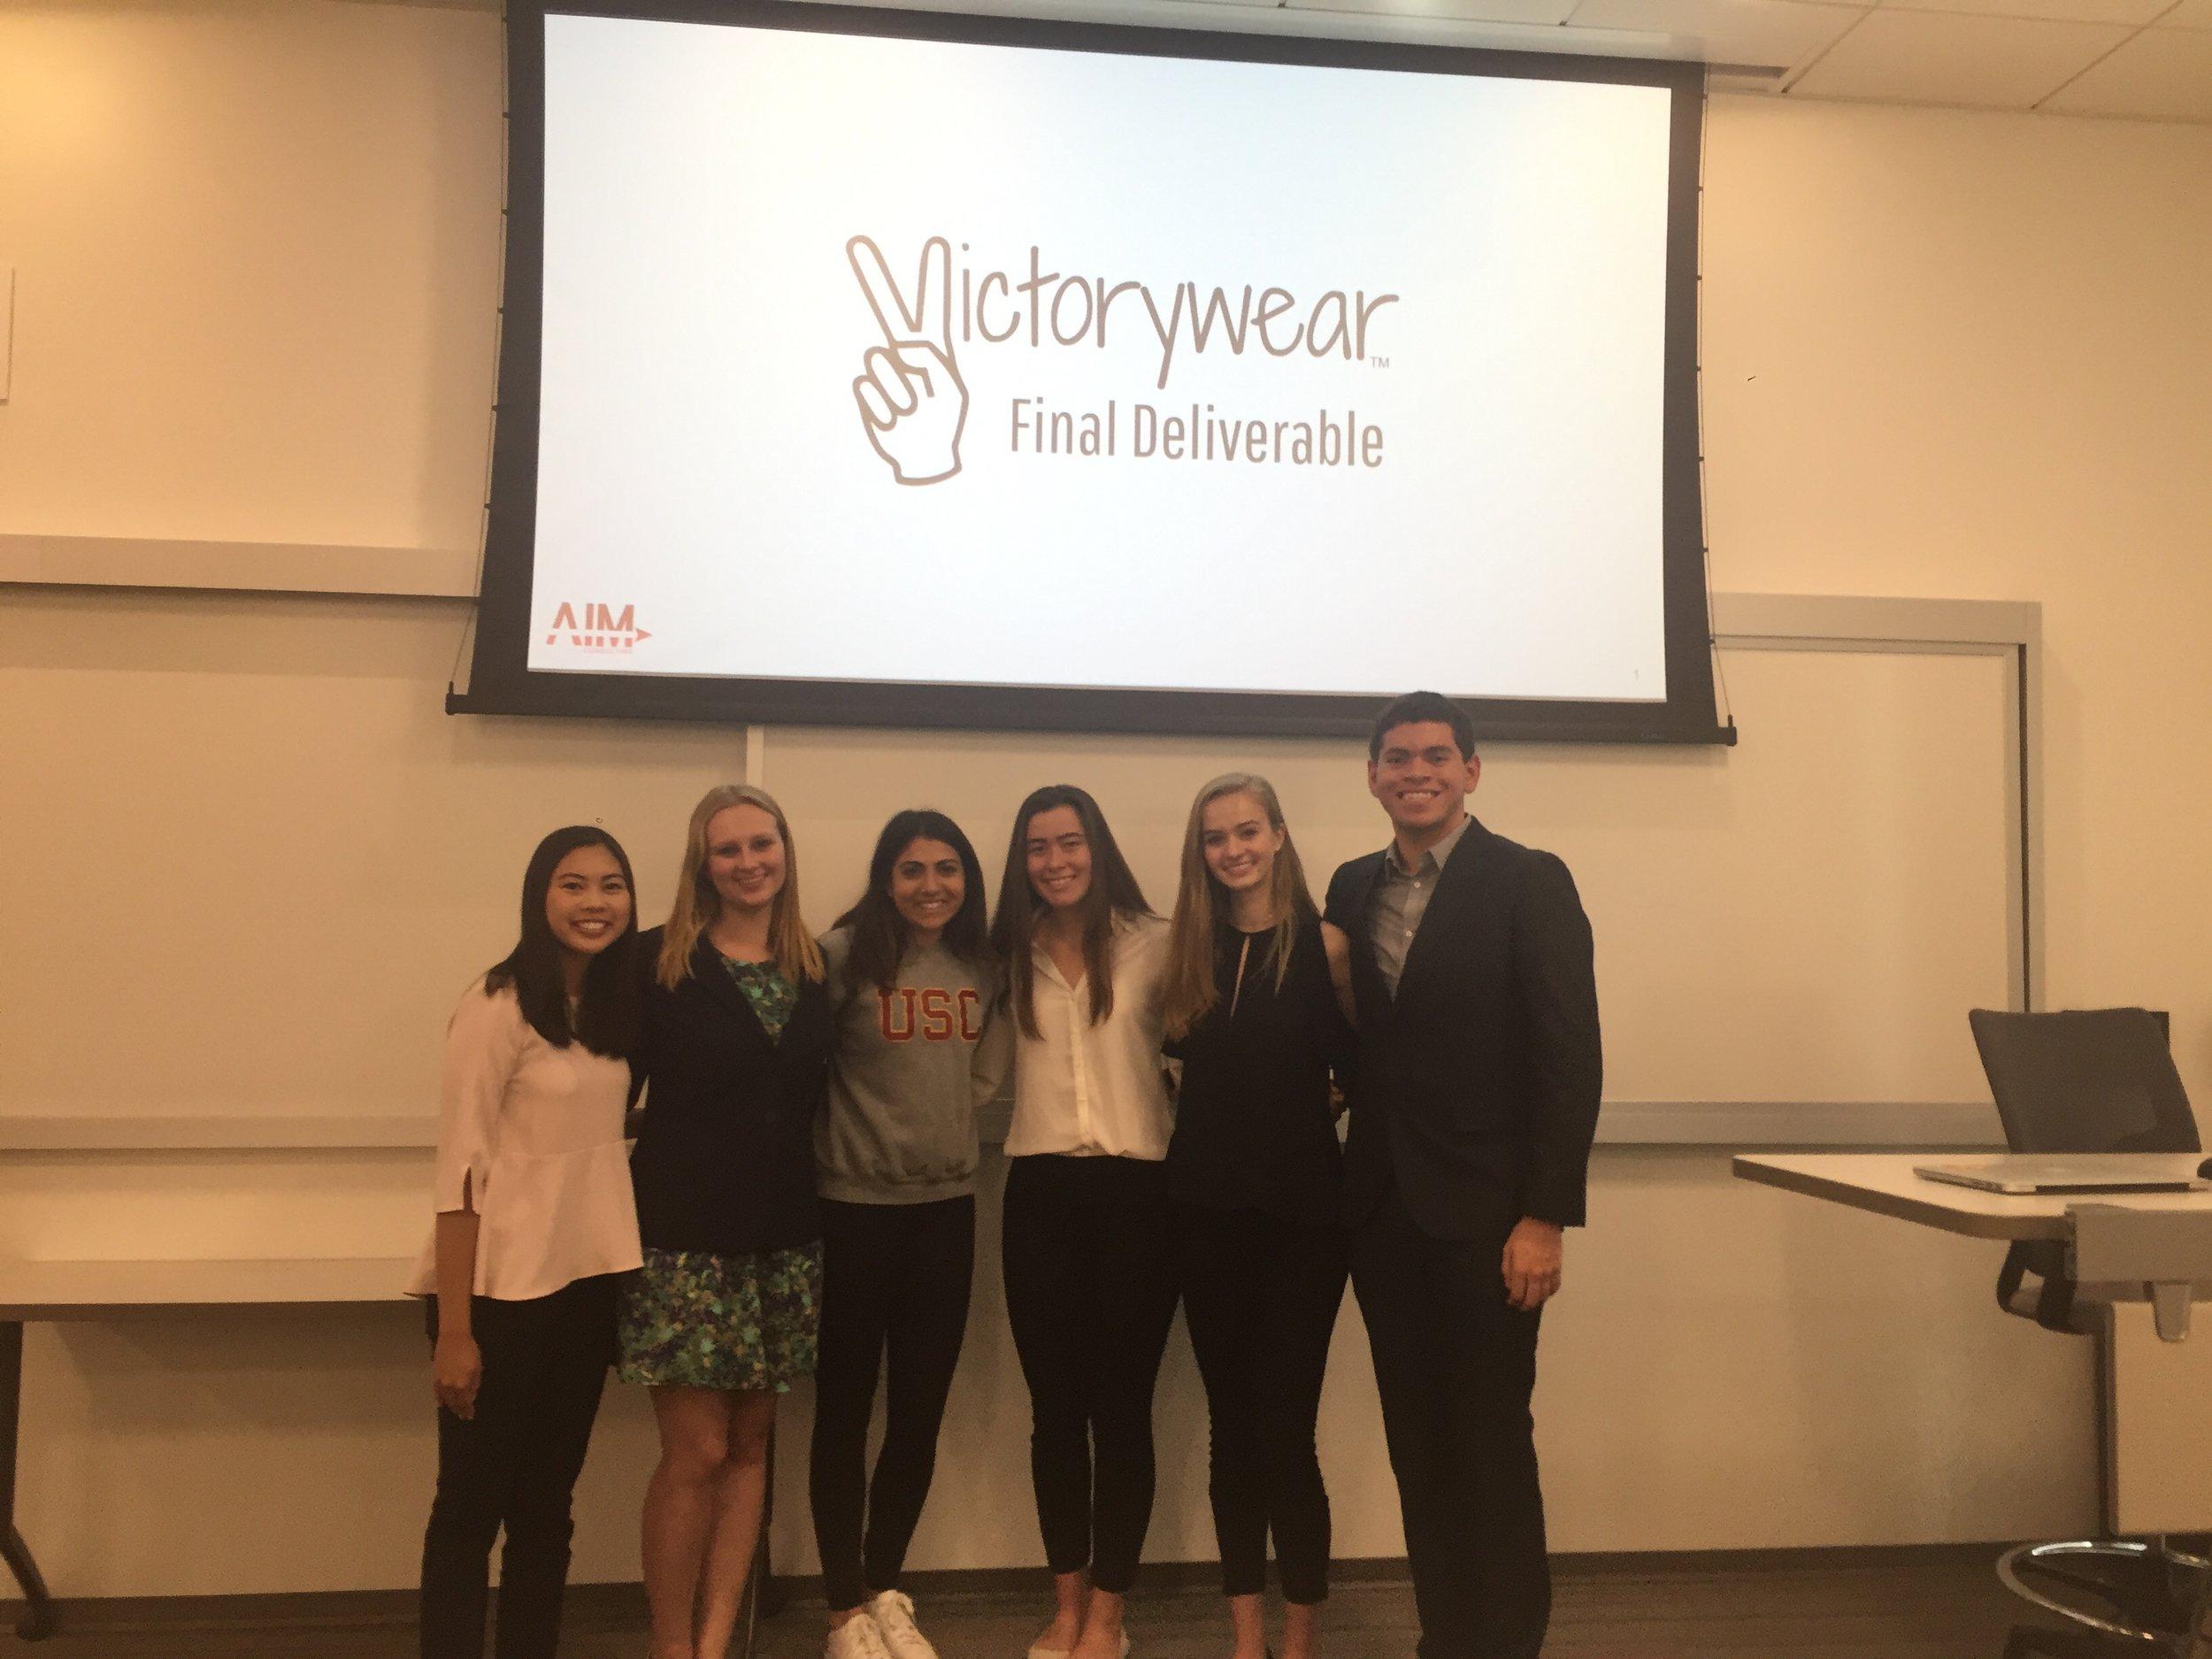 Consultants presenting to the founder of Victorywear. (L-R: Dani Toda, Emily Moneymaker, Victorywear representative, Emily Heuring, Emma Hunter, Josh Hunt).